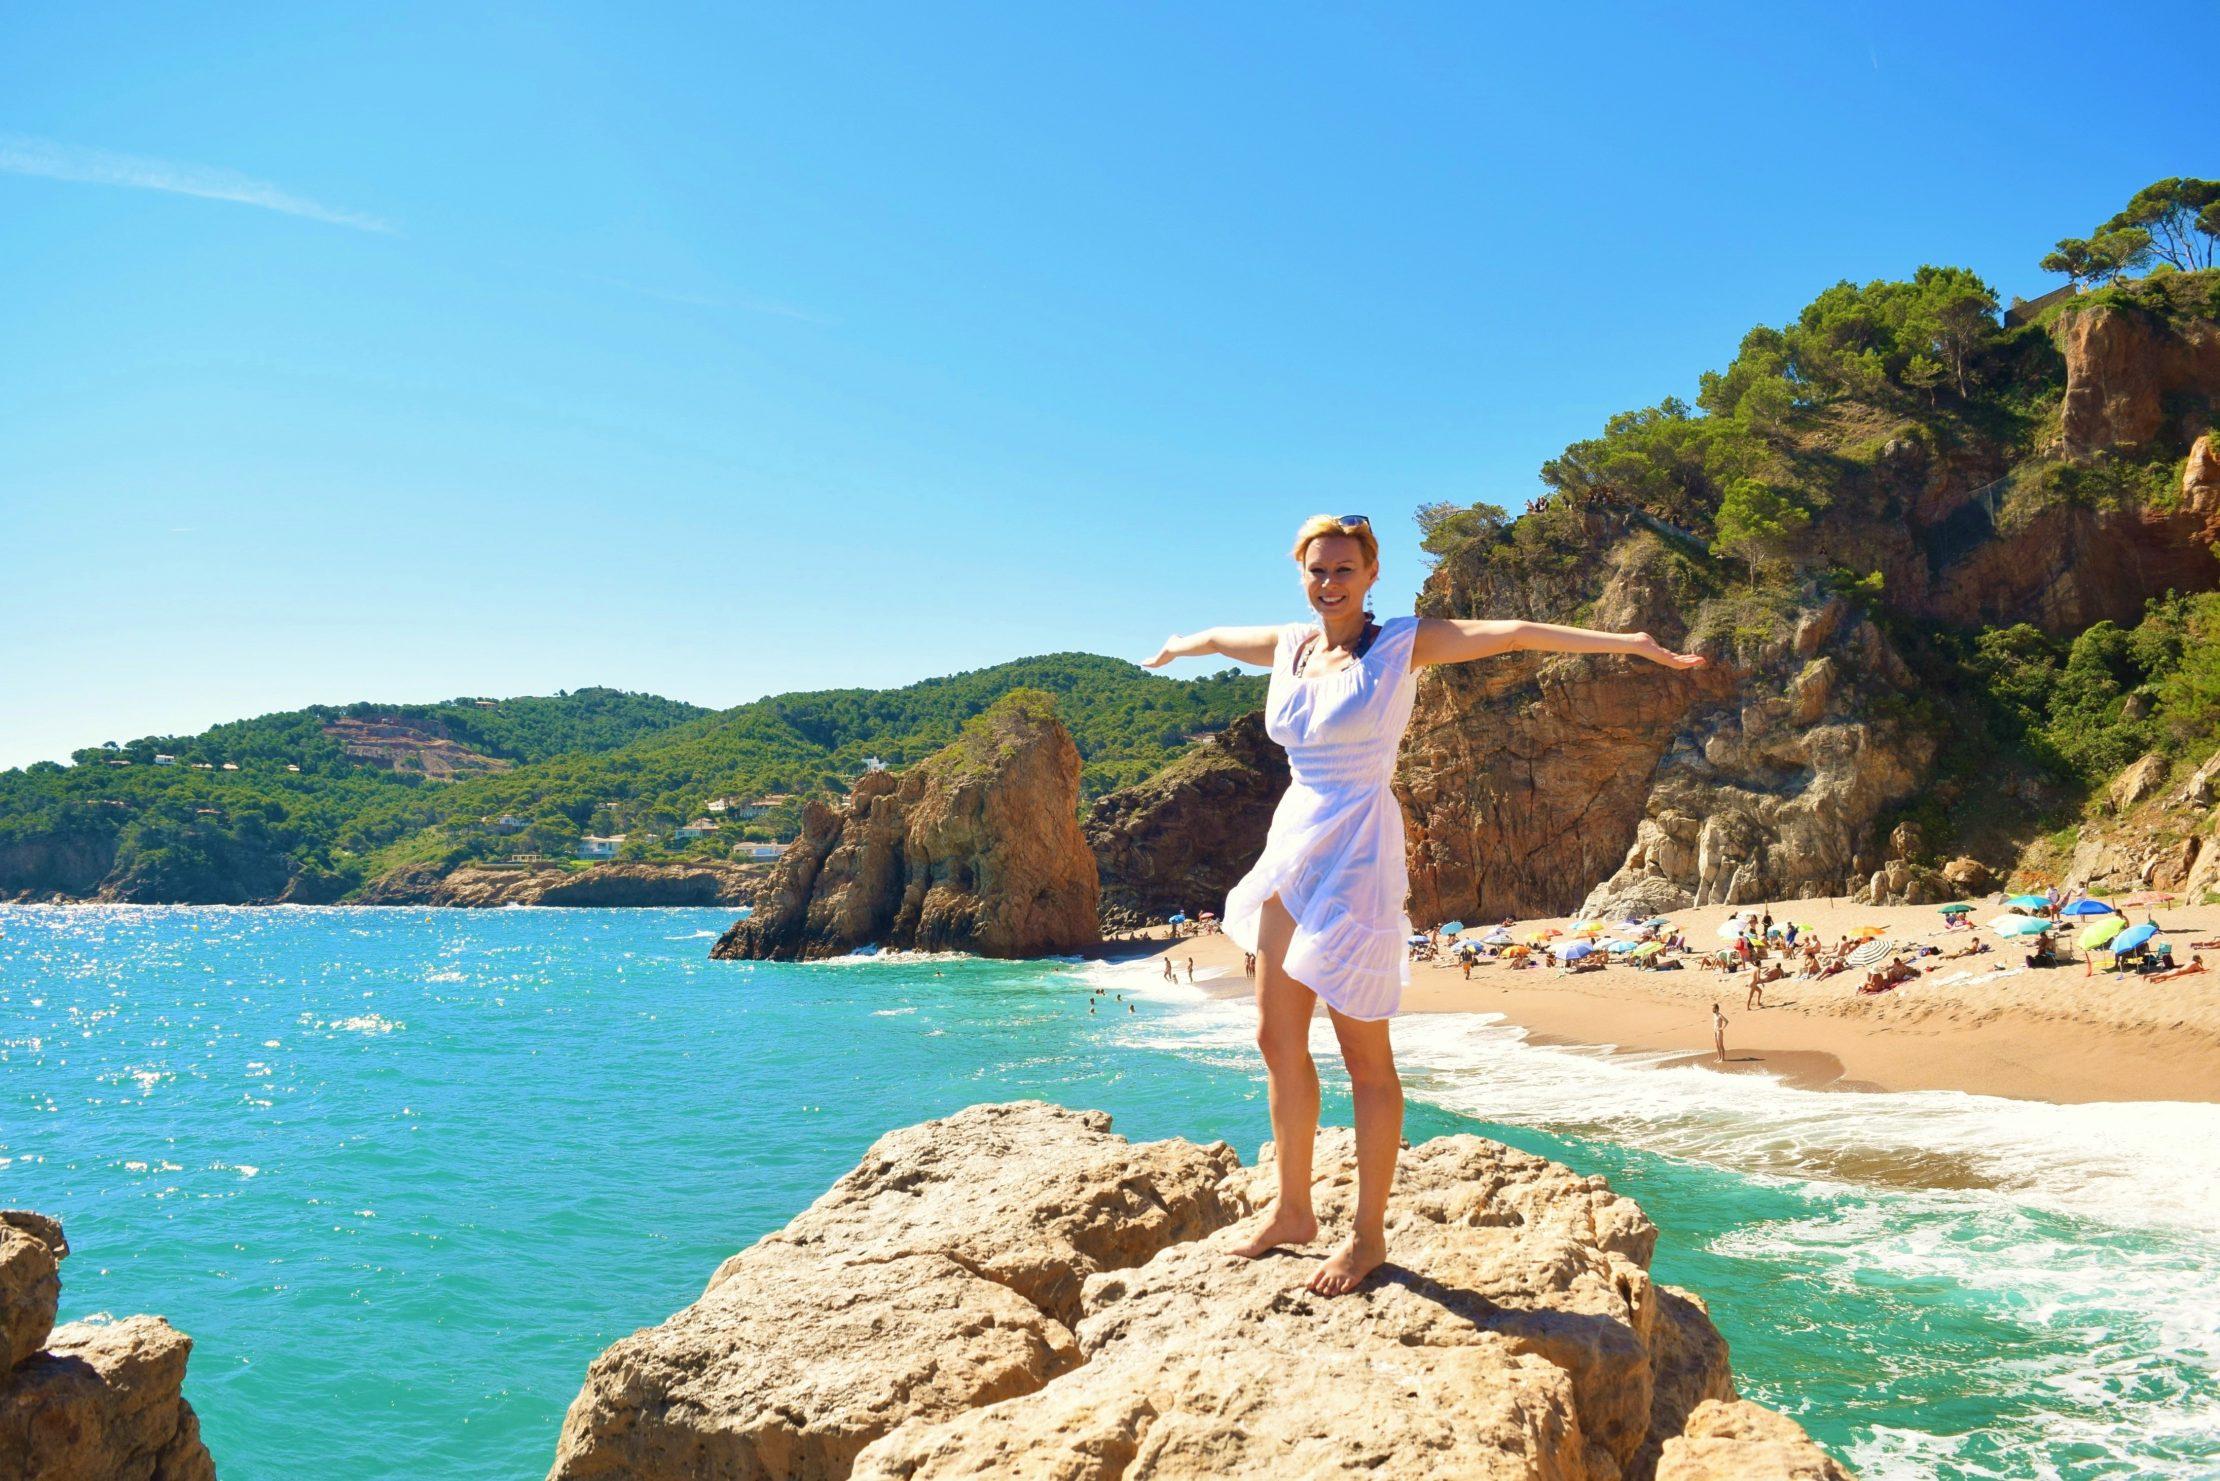 Best beaches in Costa Brava - photo copyright Malgorzata Kmita euroviajar.com